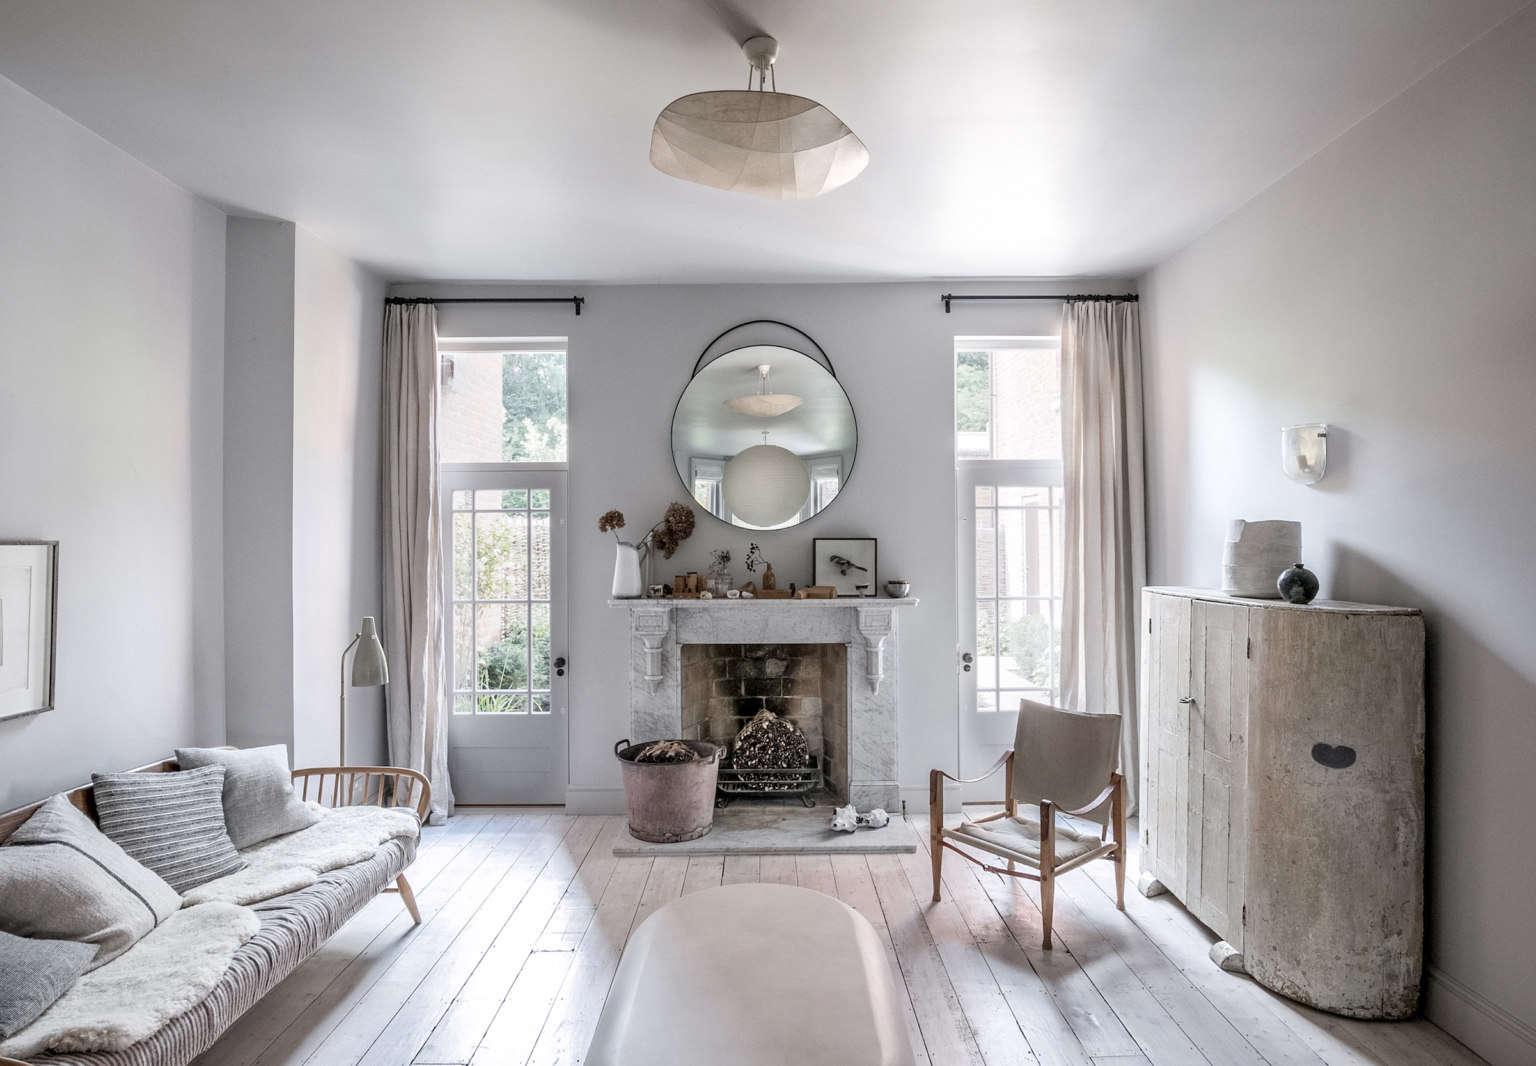 Design Luminary Faye Toogoods FamilyFriendly Minimalist Apartment portrait 3